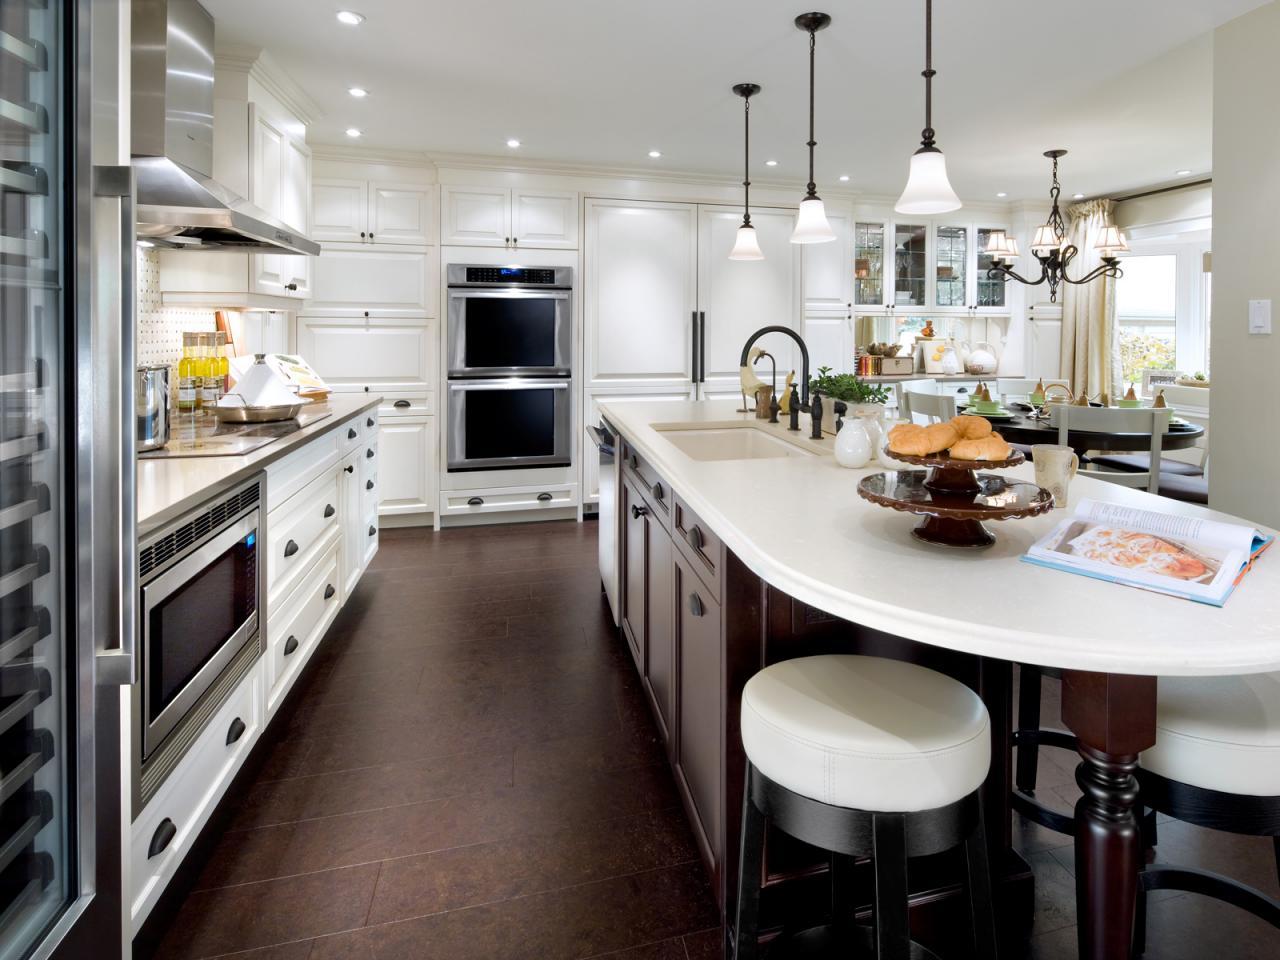 candice olson kitchen layouts photo - 1